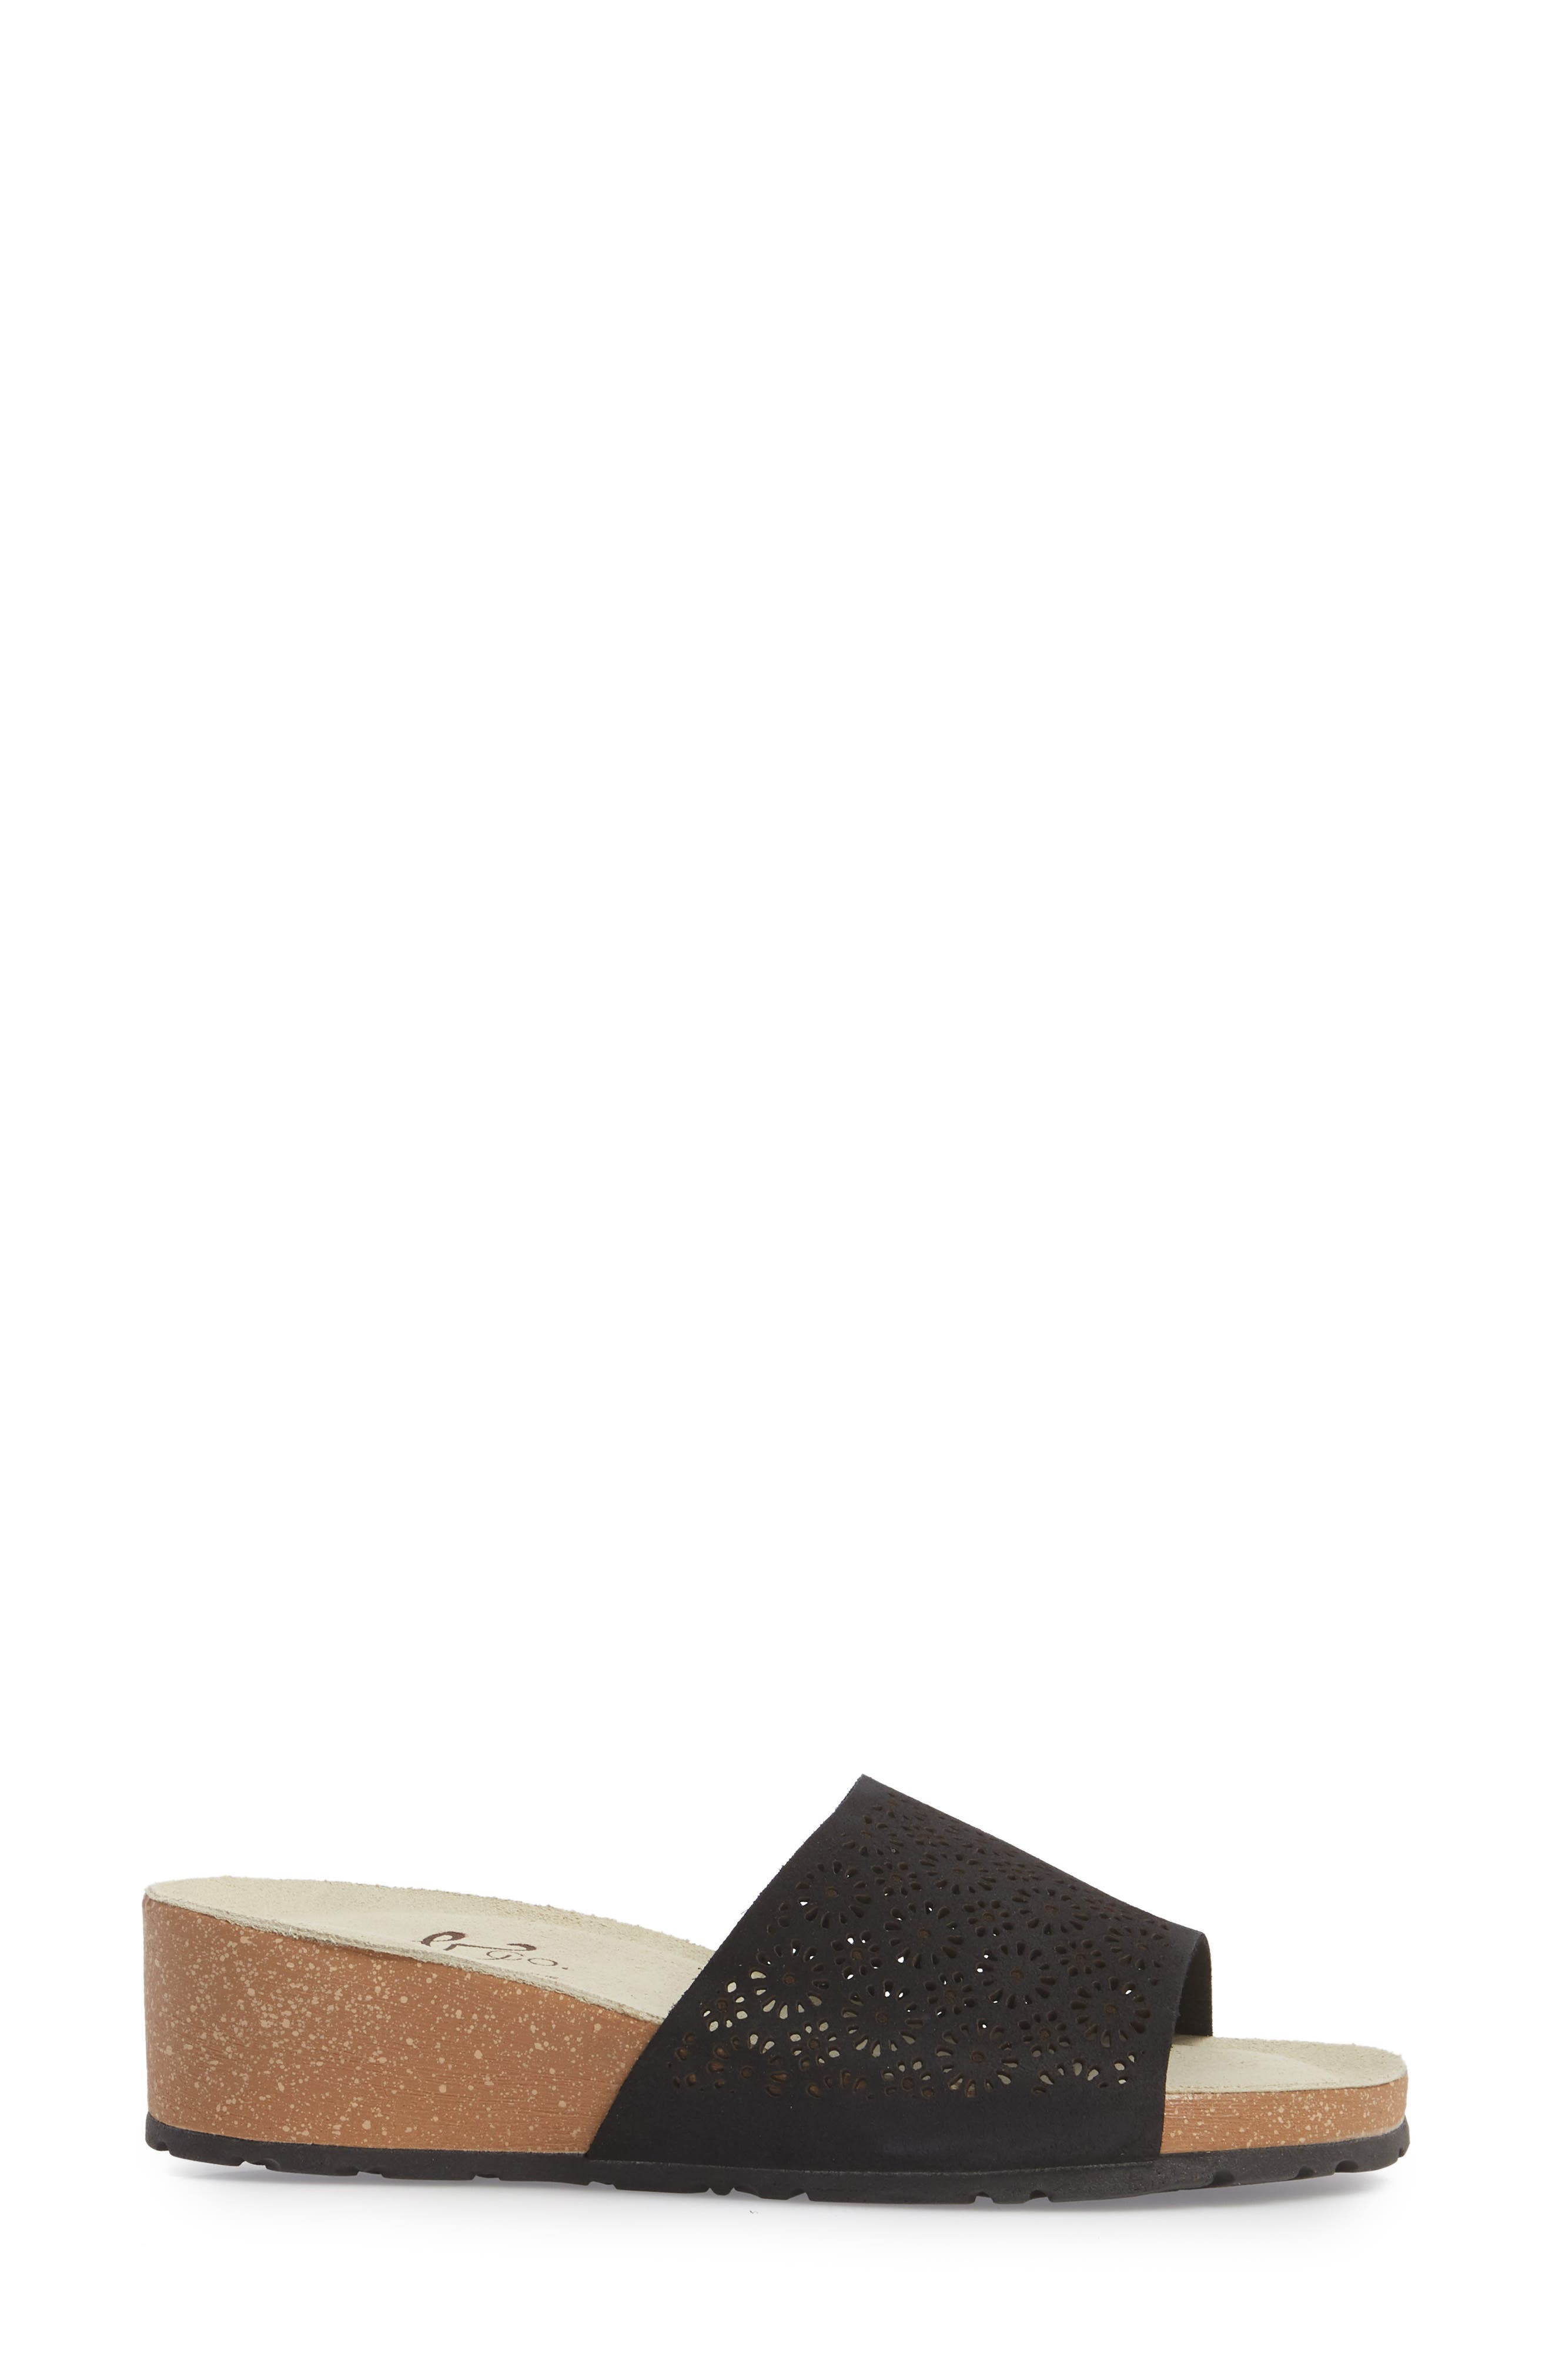 BOS. & CO., Loa Wedge Slide Sandal, Alternate thumbnail 3, color, BLACK SUEDE